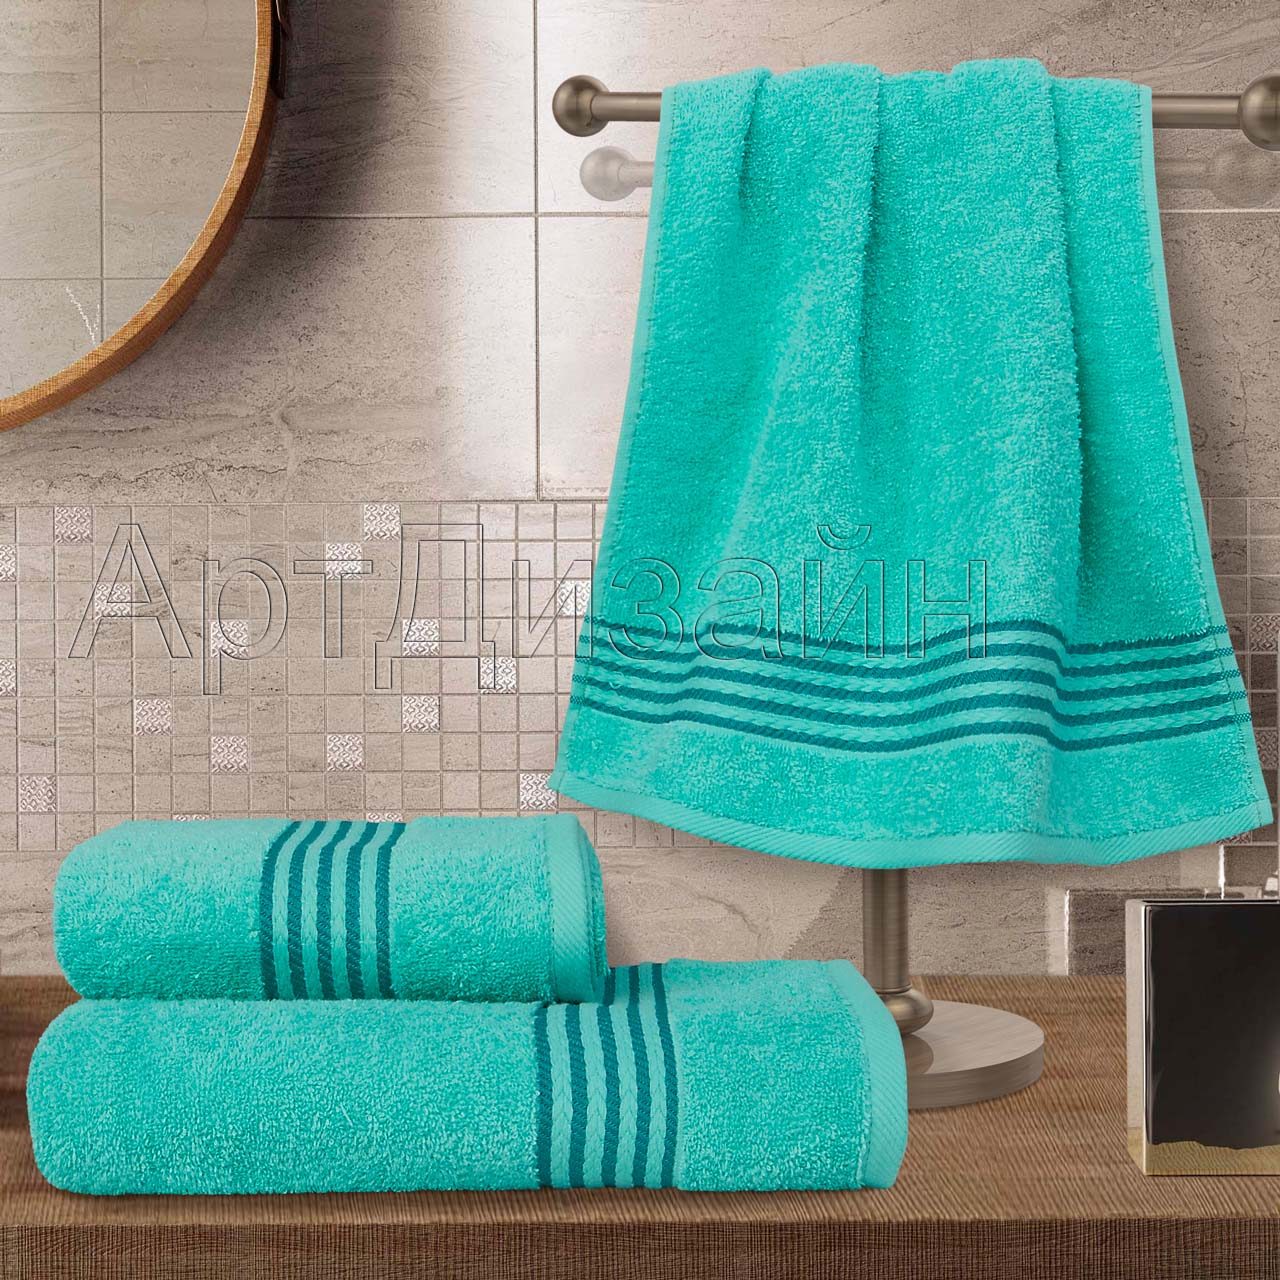 Полотенце Классик Аква р. 40х70Махровые полотенца<br>Плотность:400 г/кв. м<br><br>Тип: Полотенце<br>Размер: 40х70<br>Материал: Махра